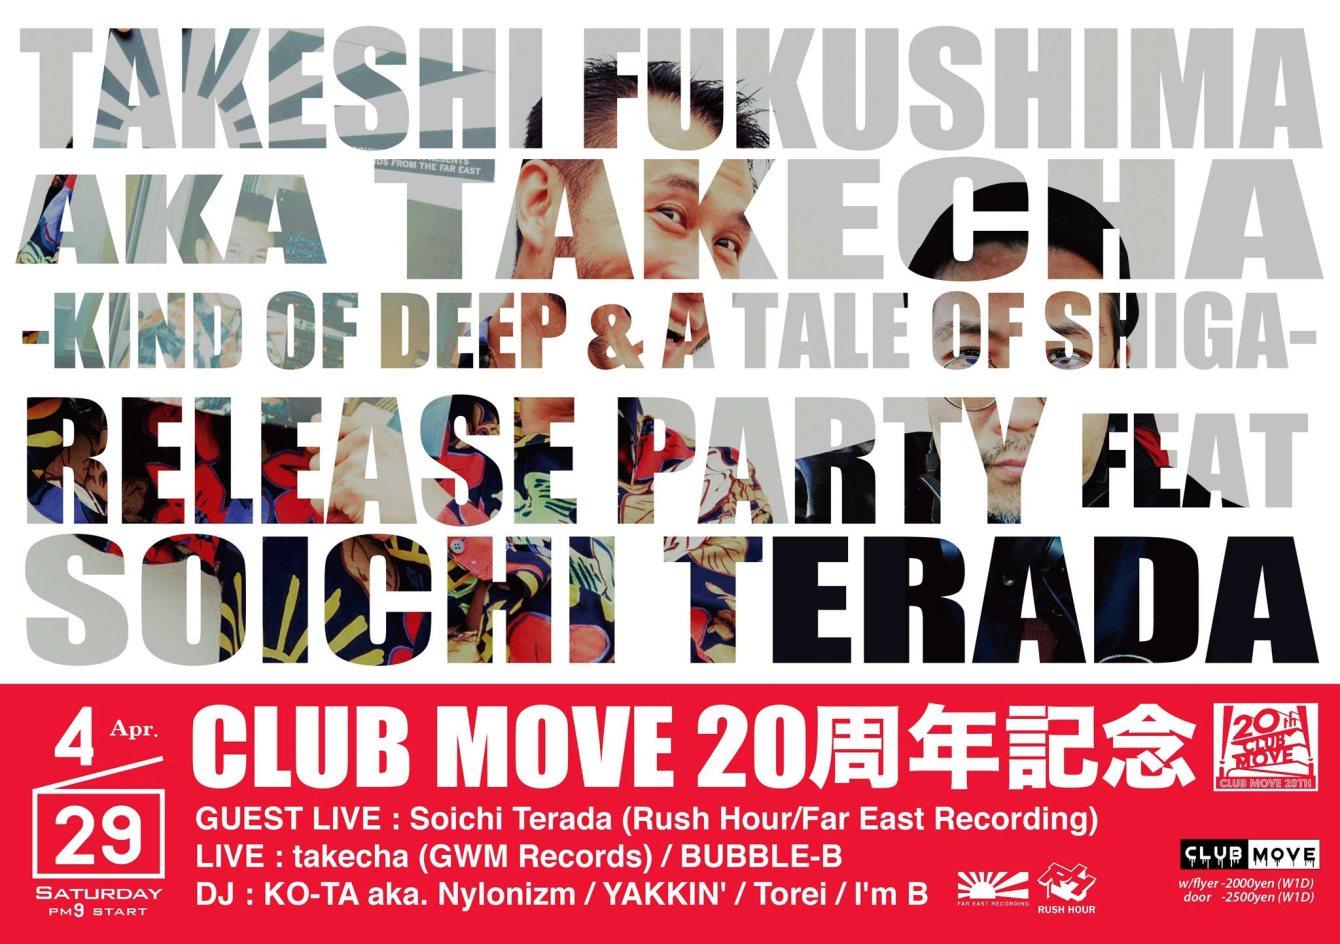 Takeshi Fukushima -Kind Of Deep & A Tale Of Shiga- Release Party feat. Soichi Terada - Flyer front